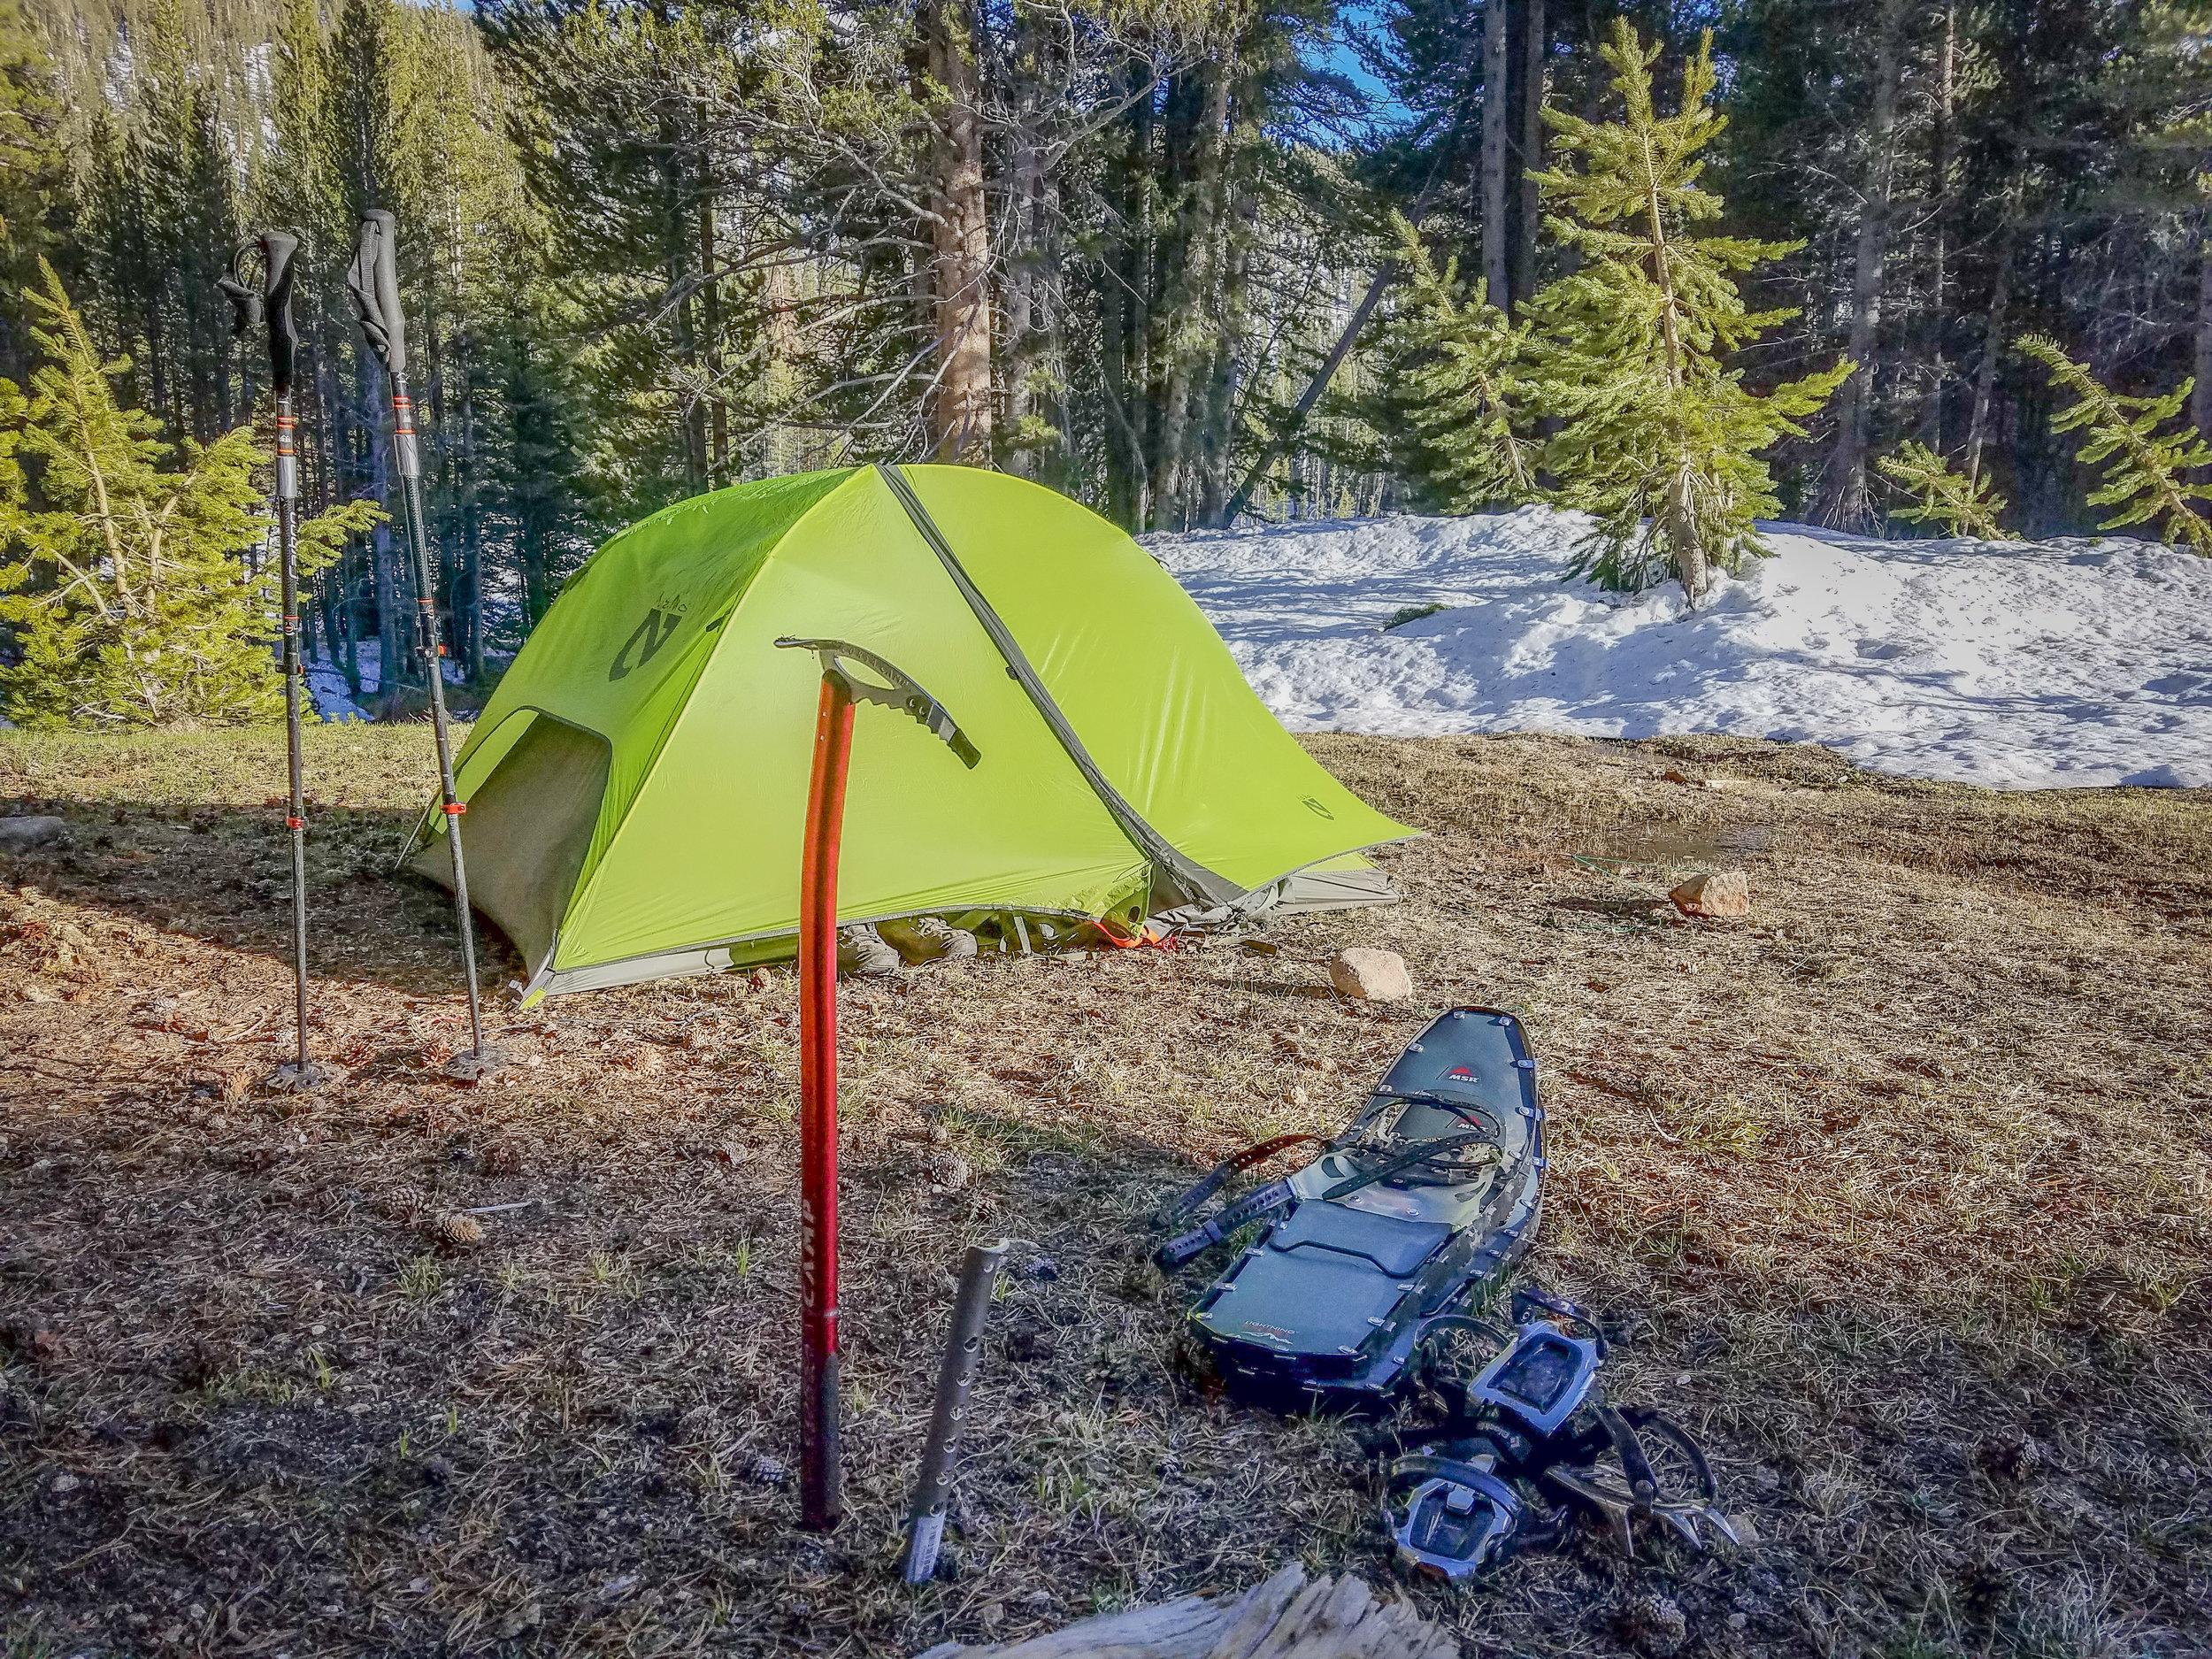 Camp just above Rock Creek